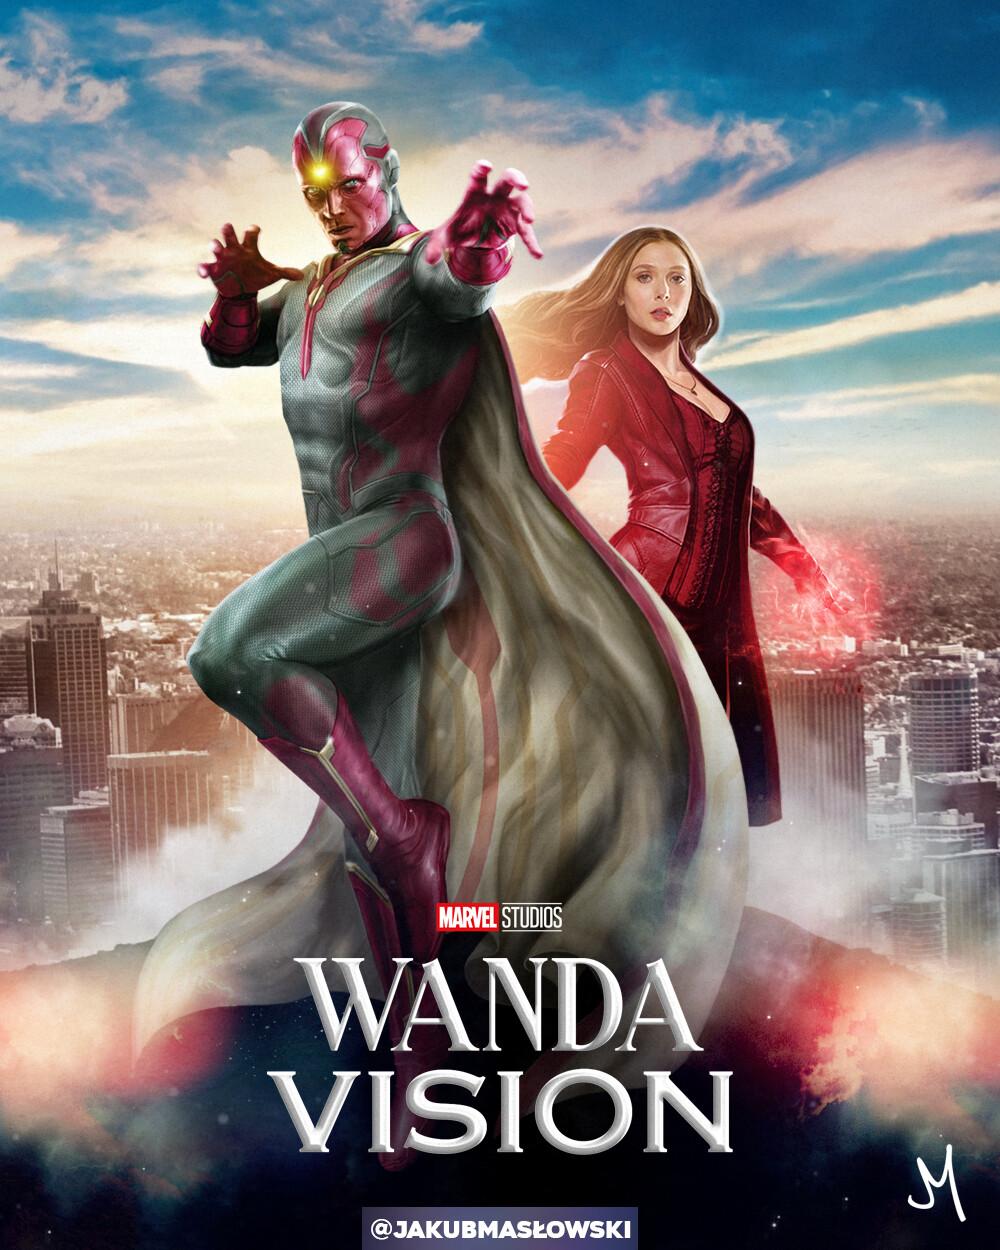 Wanda Vision - Vietsub Thuyết Minh